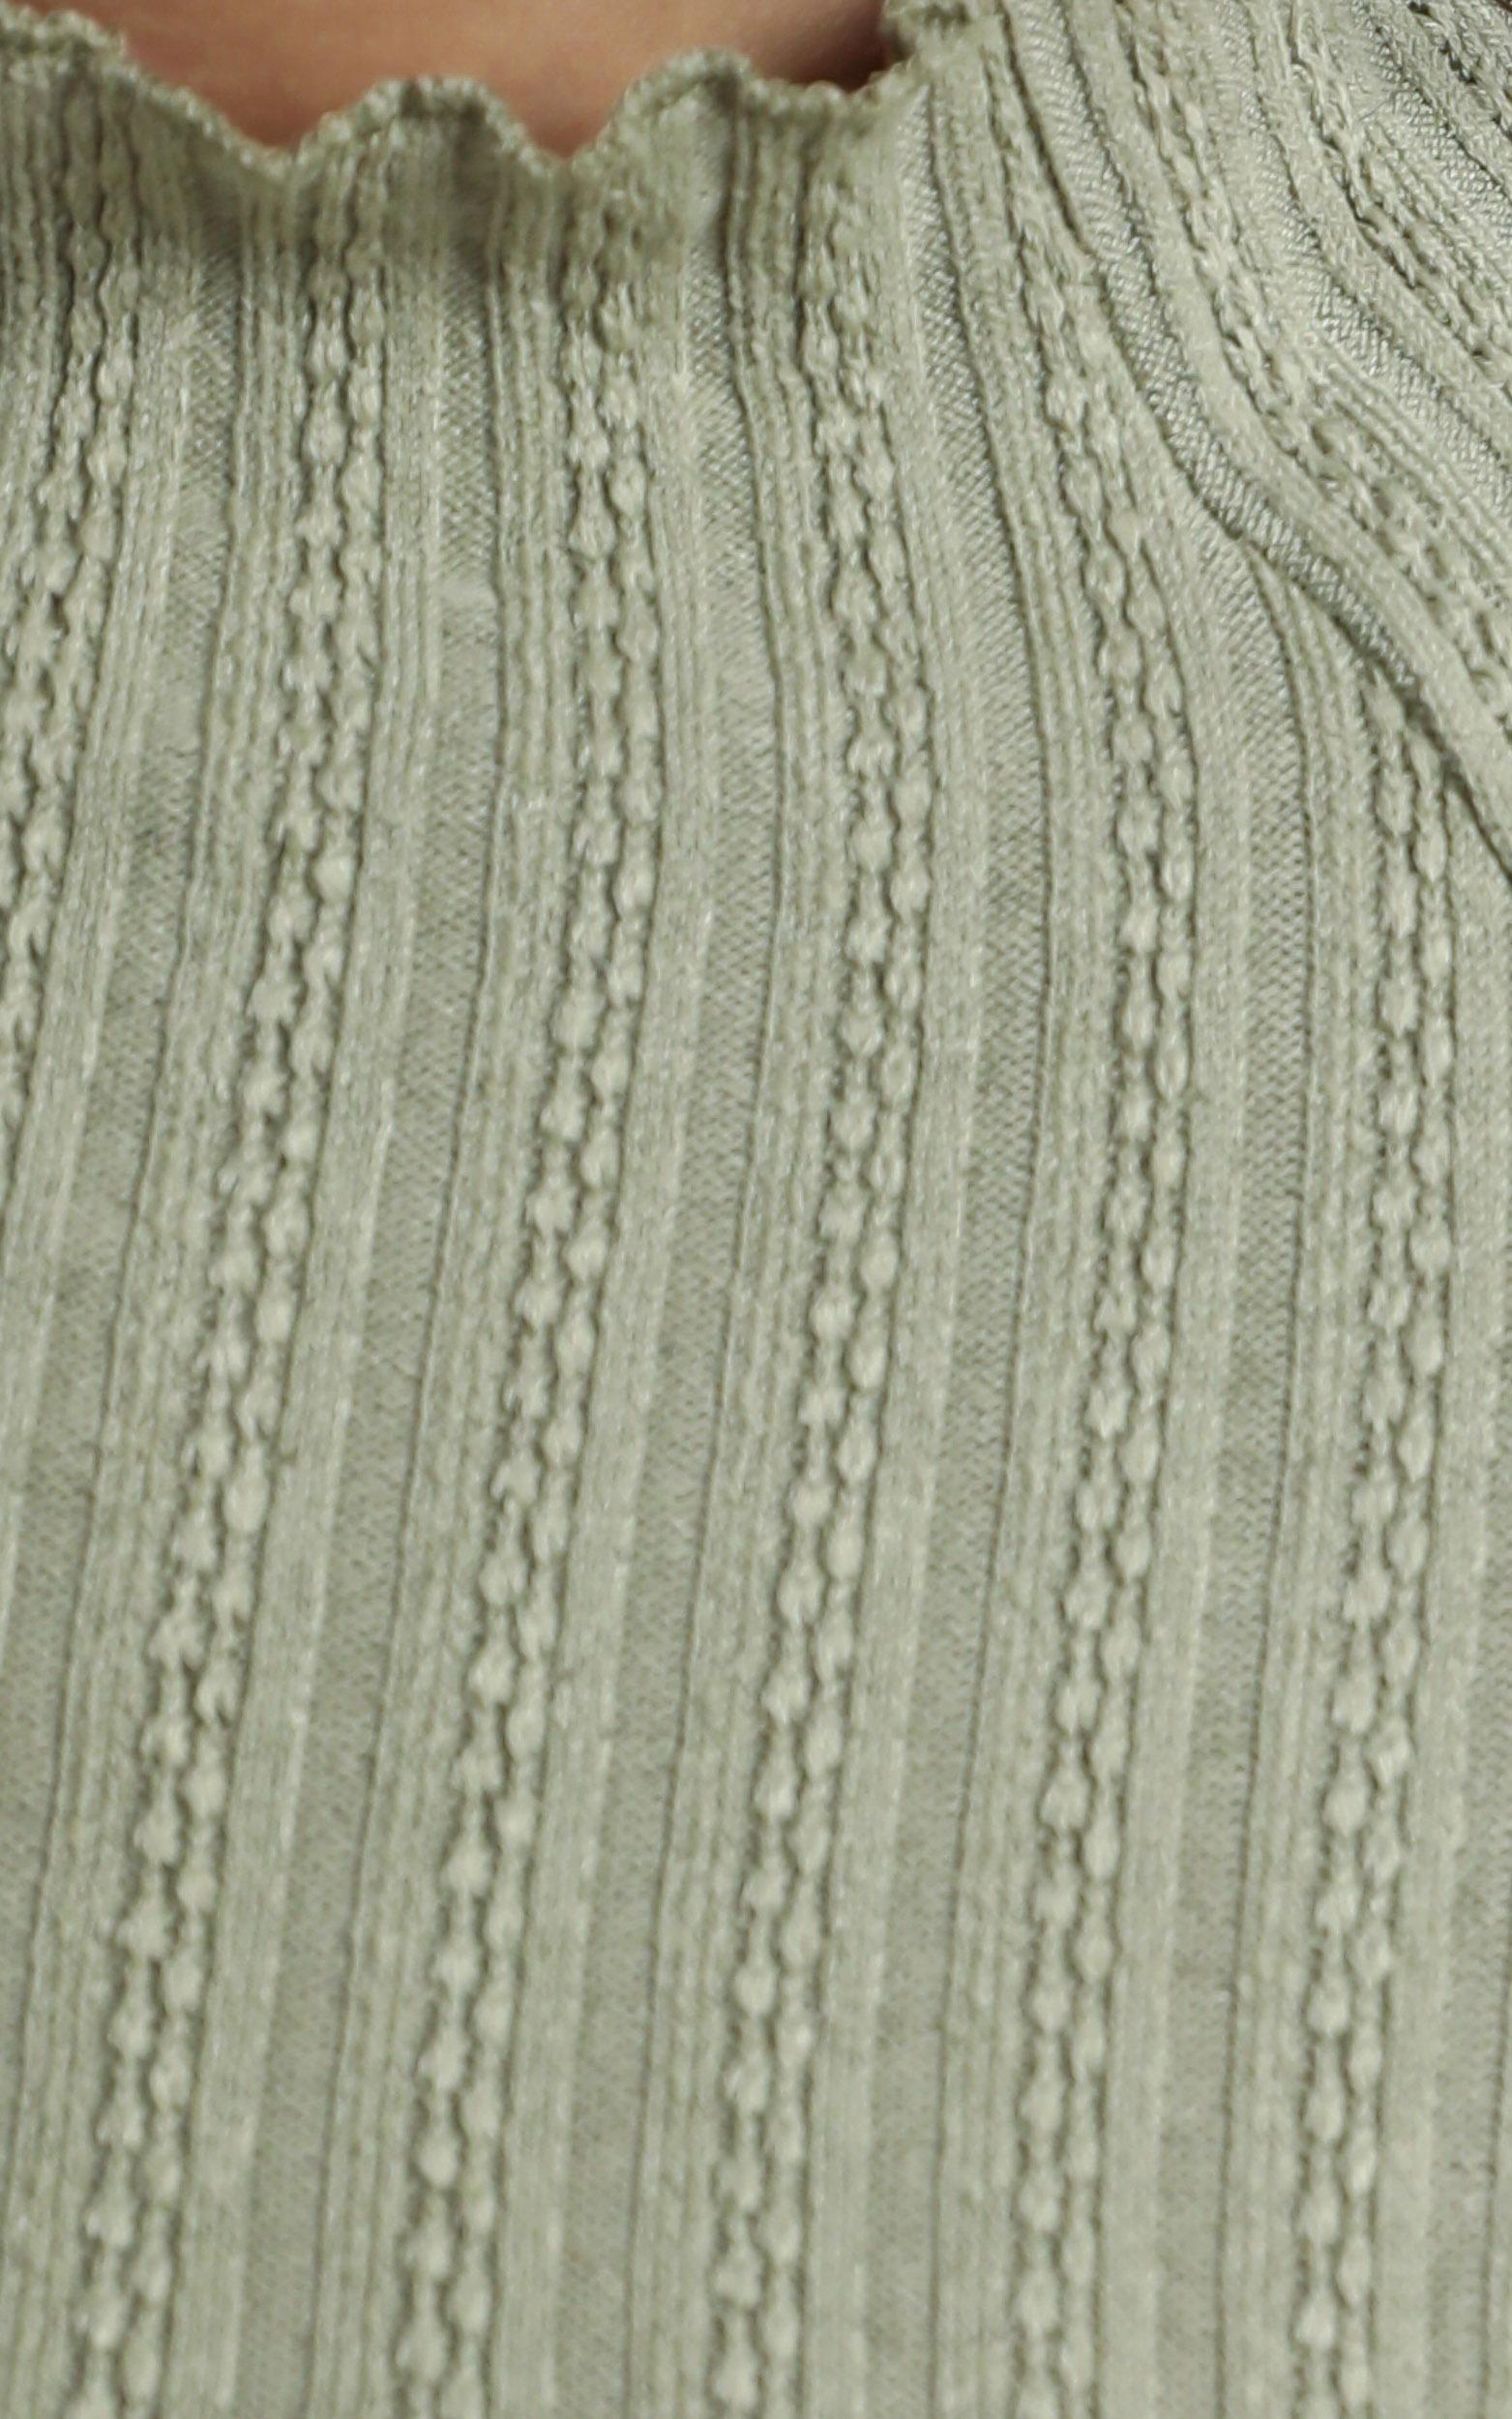 Jonah Dress in Khaki - 12 (L), Khaki, hi-res image number null